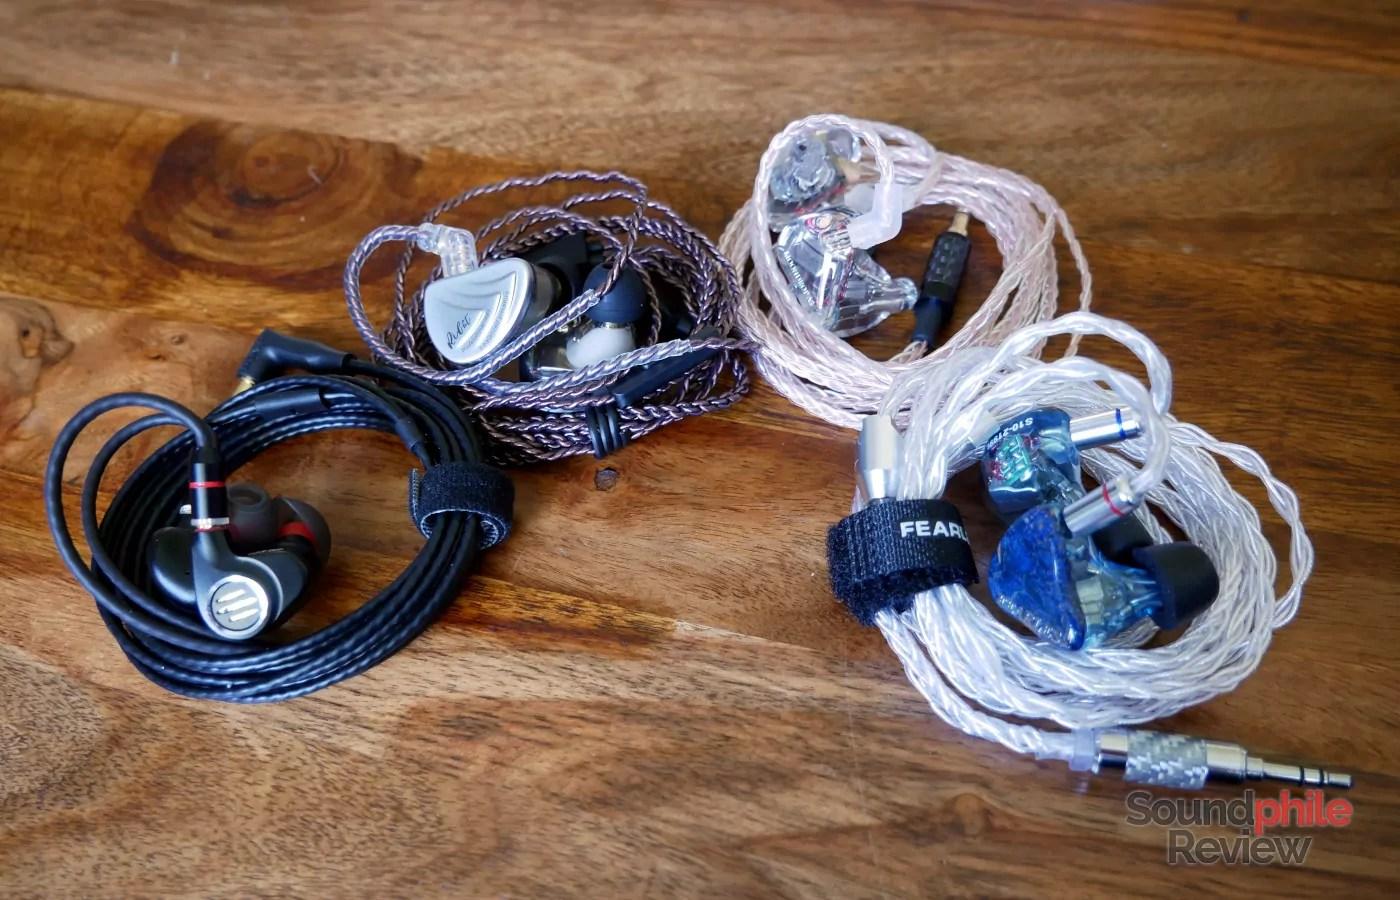 Moondrop A8 KZ AS10 Fearless Audio S10 BGVP DMS Headphones in Pictures